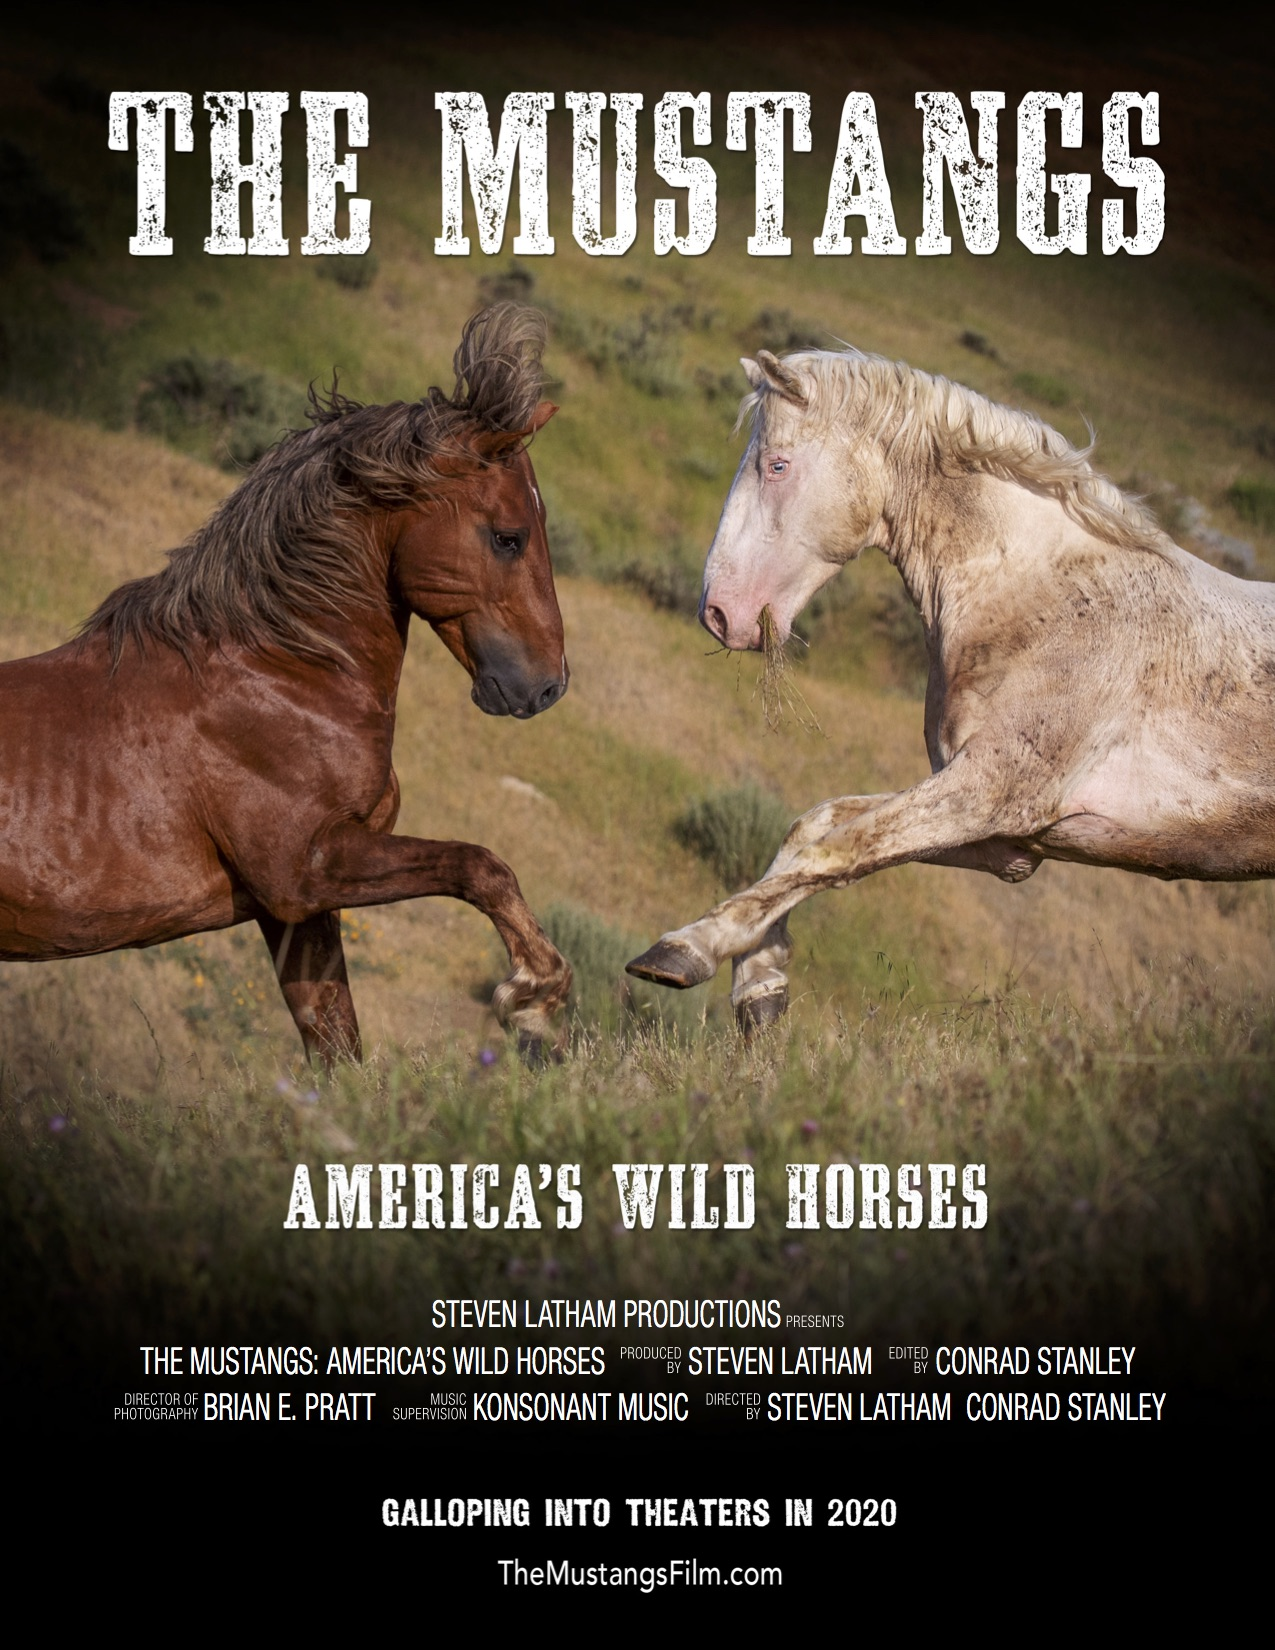 MUSTANGS 8.5x11 2 horse poster Feb12 150